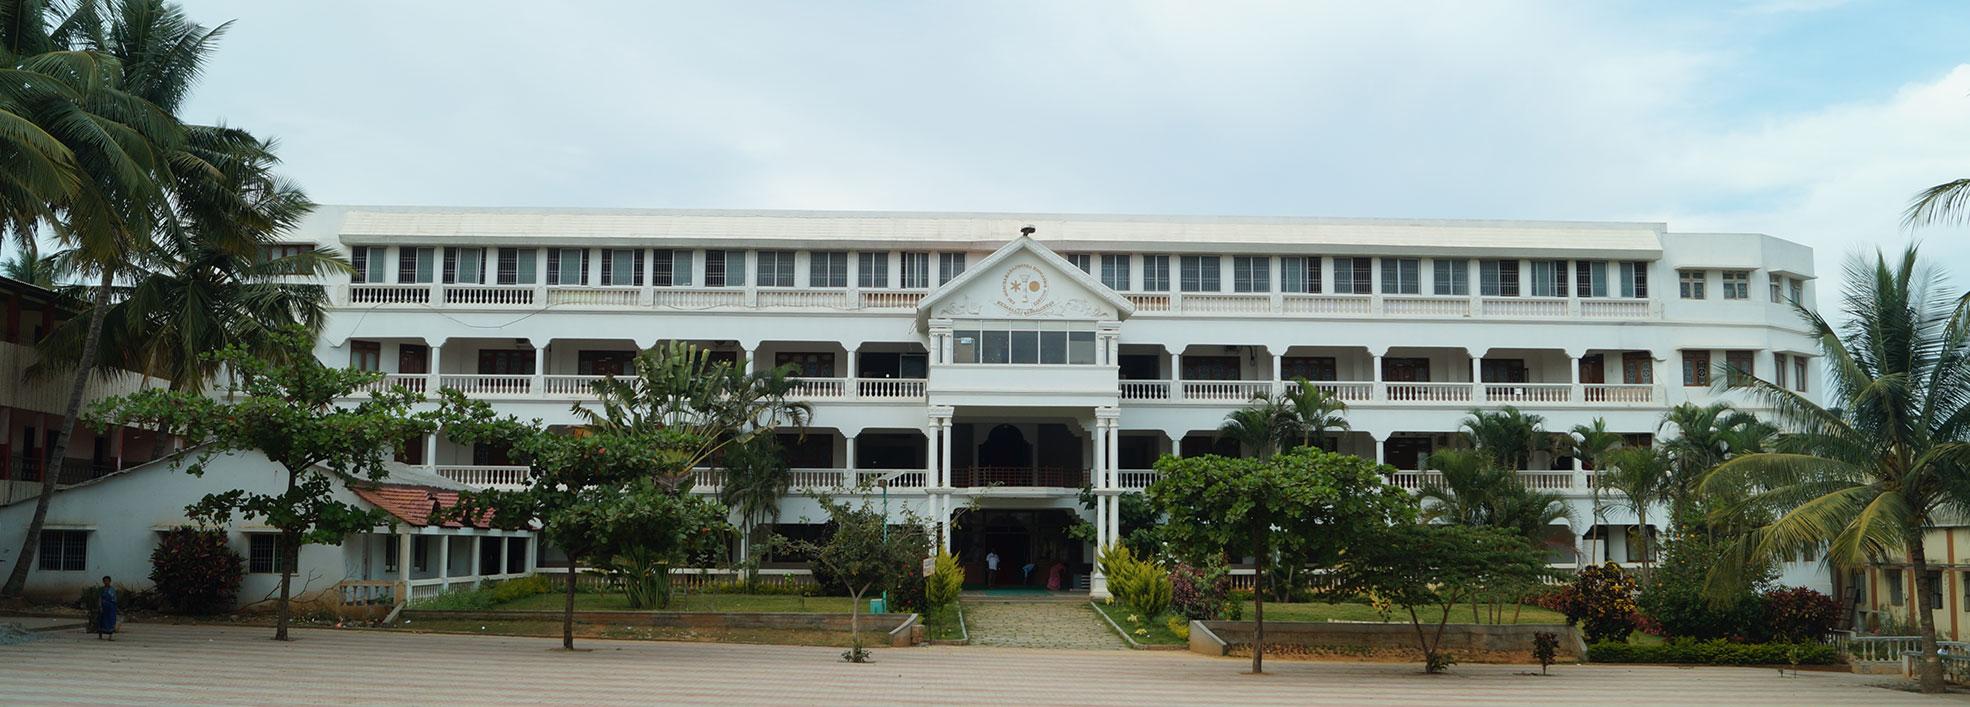 SJES College of Management Studies, Bengaluru Image